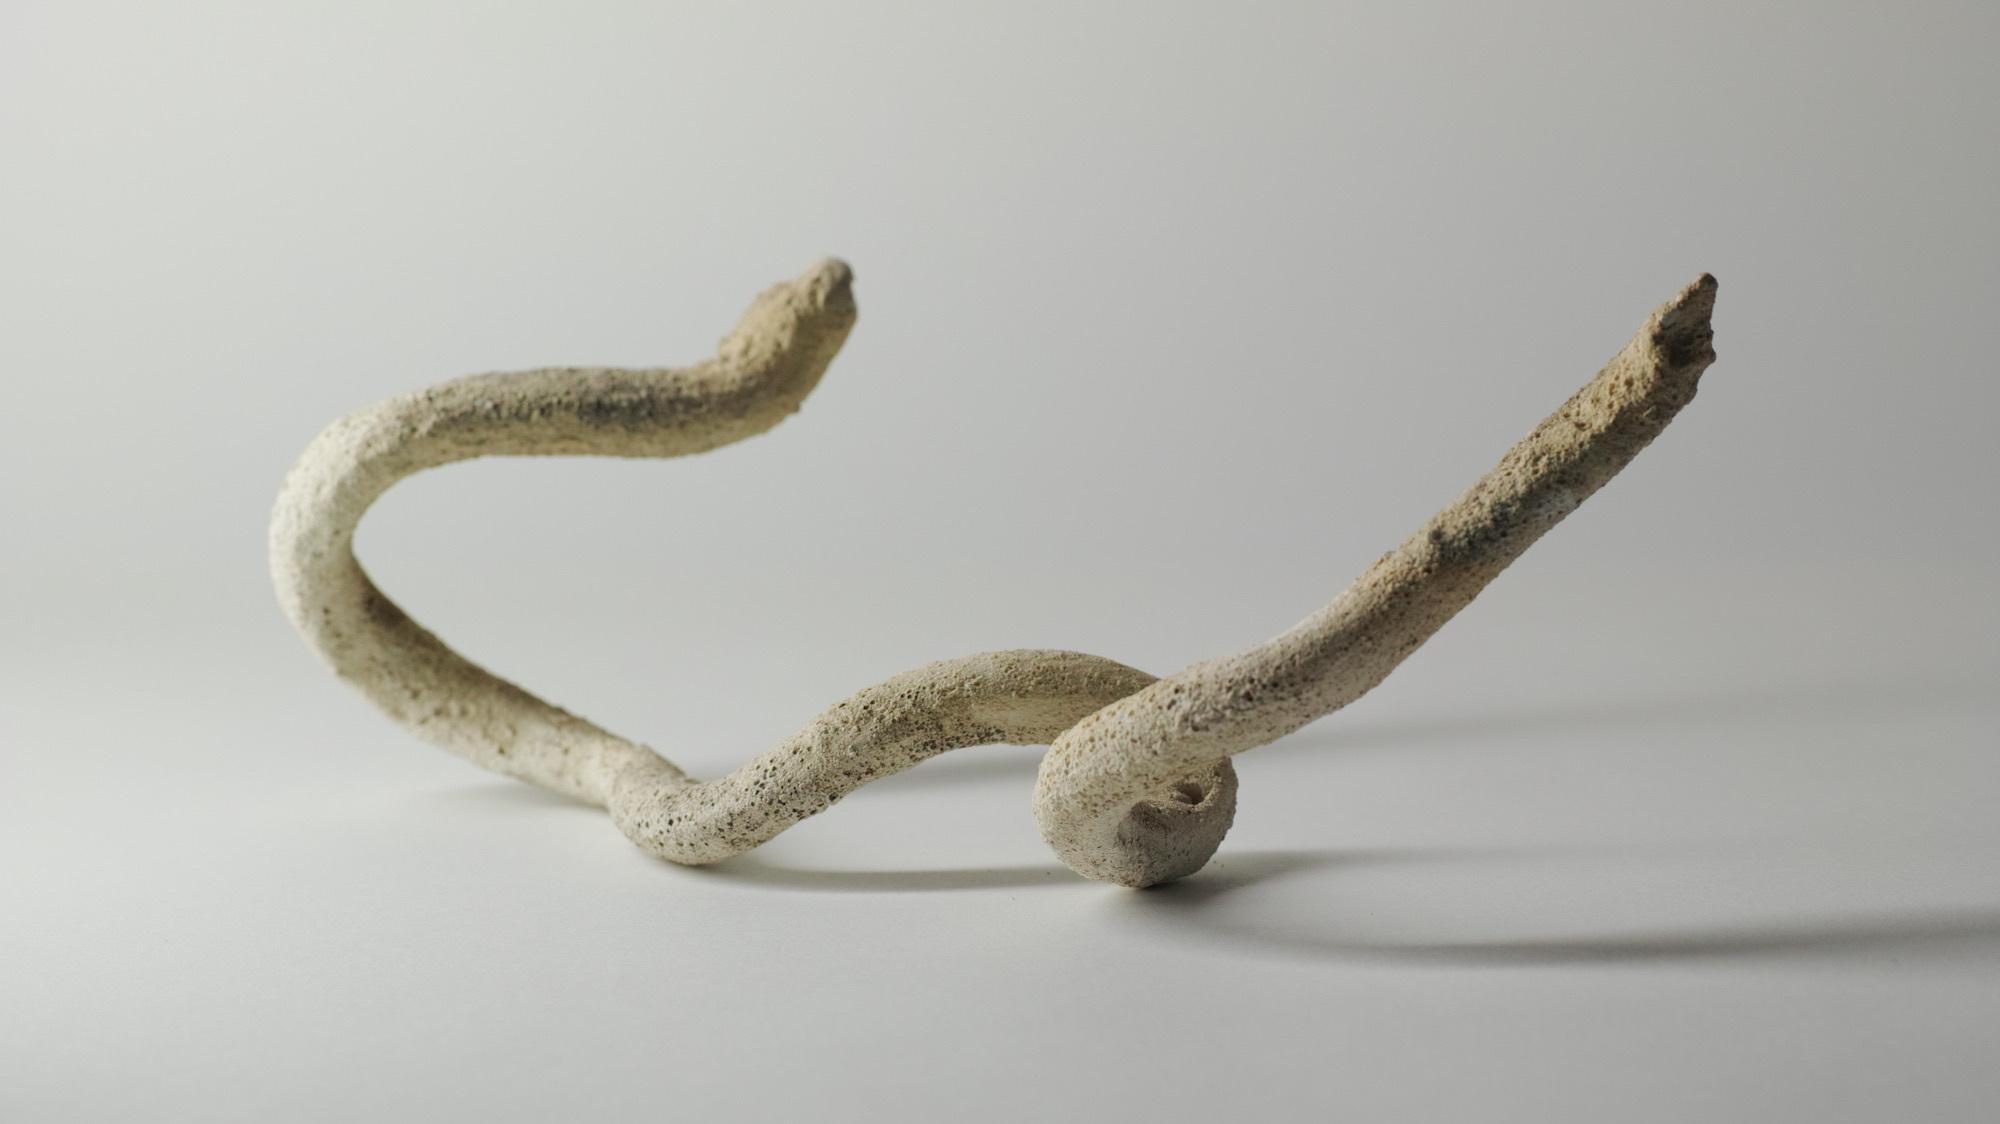 No.03_Han Yun Liang/mother cord/ceramic object